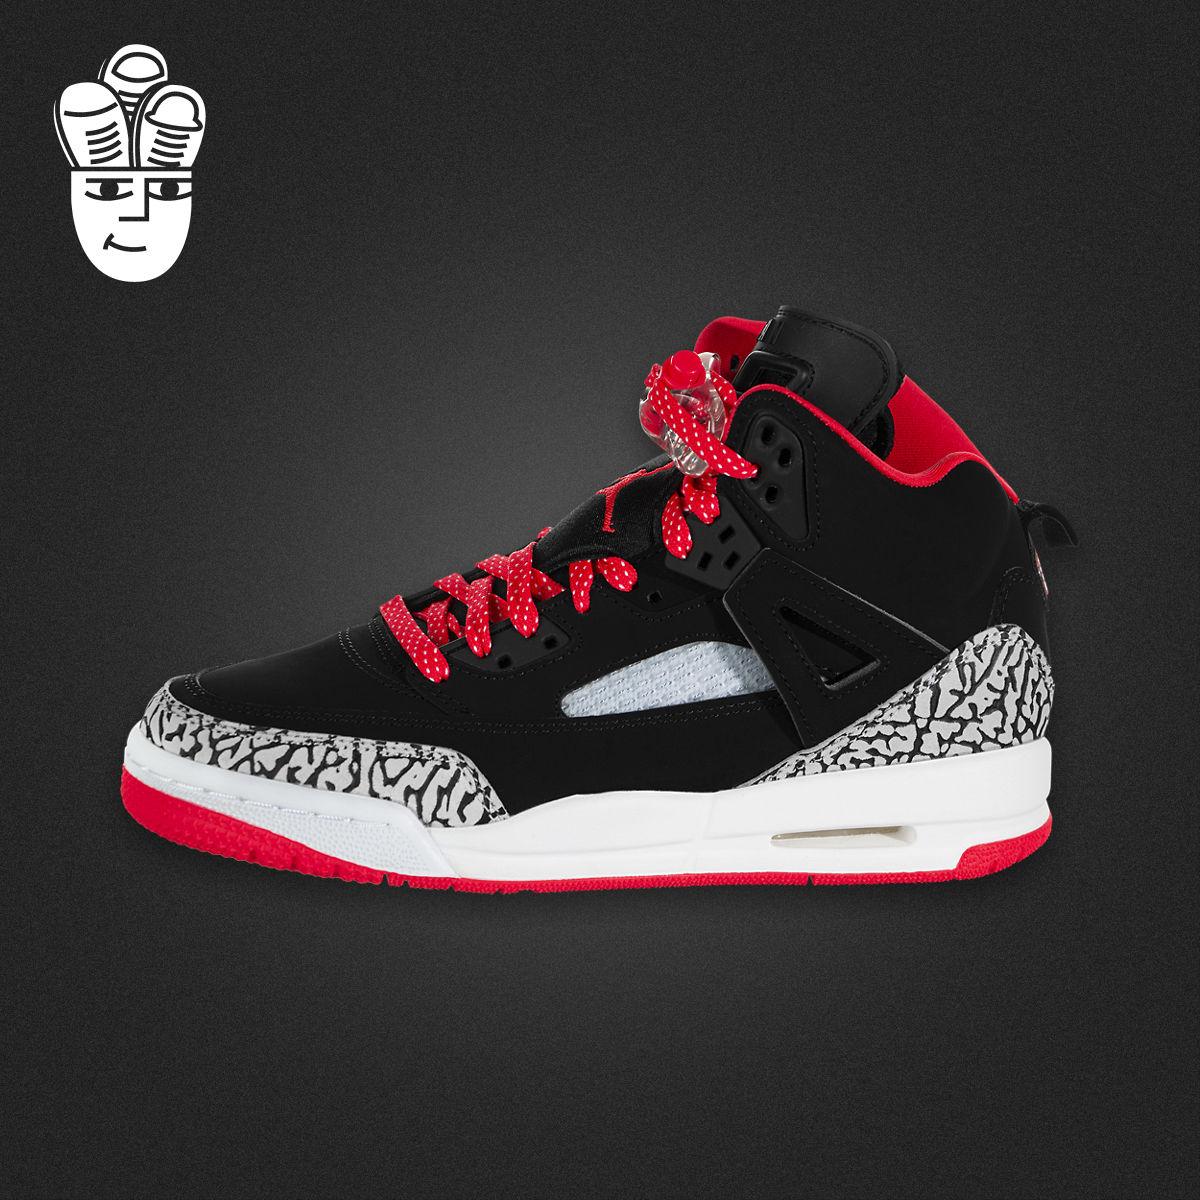 Air Jordan Spiz'ike AJ男鞋女鞋GS 斯派克系列篮球鞋 运动休闲鞋